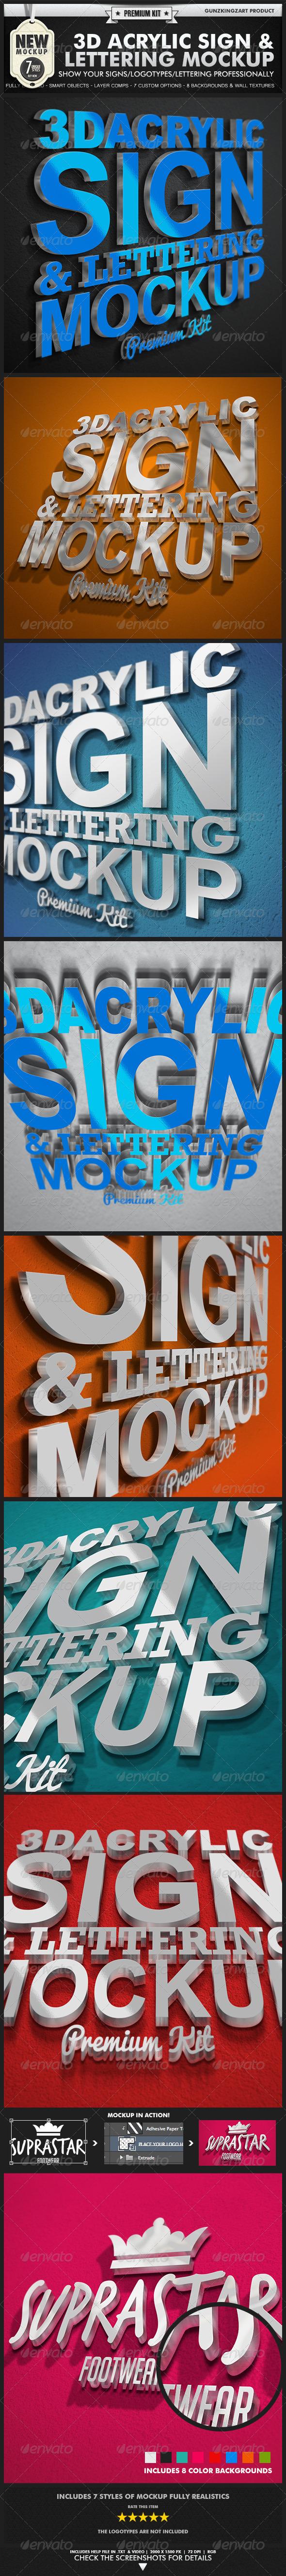 3D Acrylic Sign Mockup - Premium Kit - Signage Print